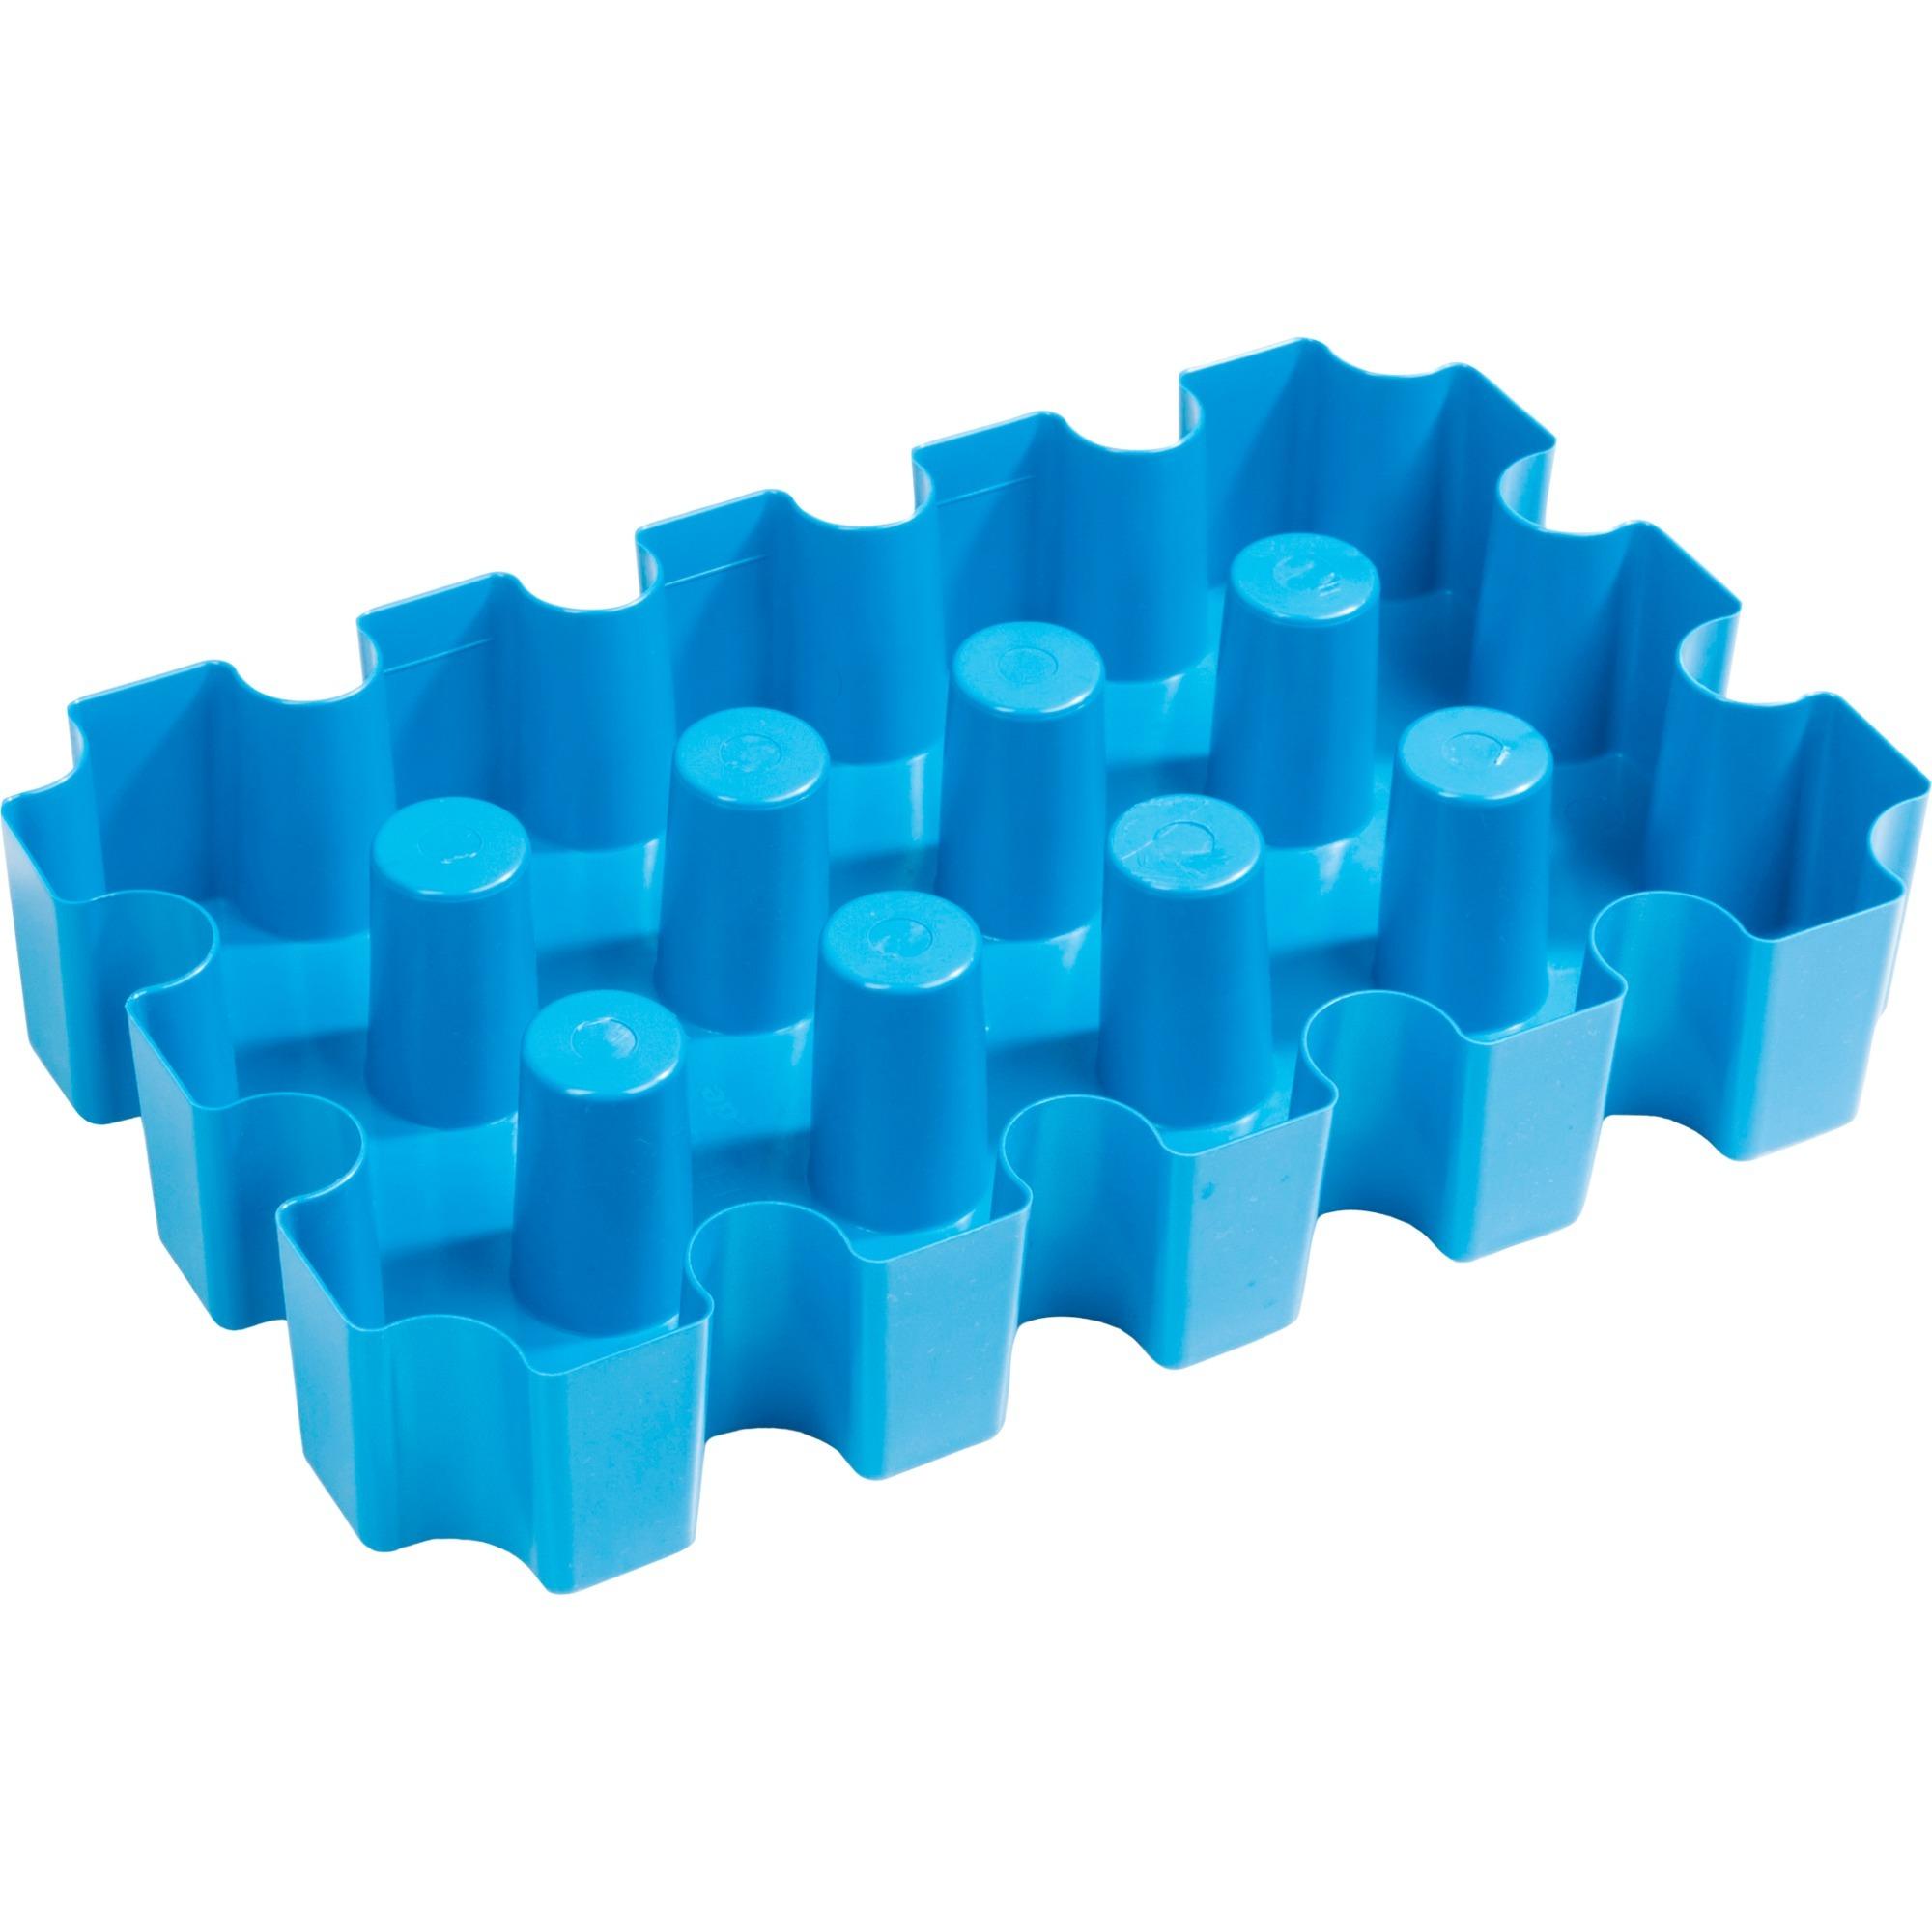 SL EISBLOCK 0,33l, Elemento refrigerante